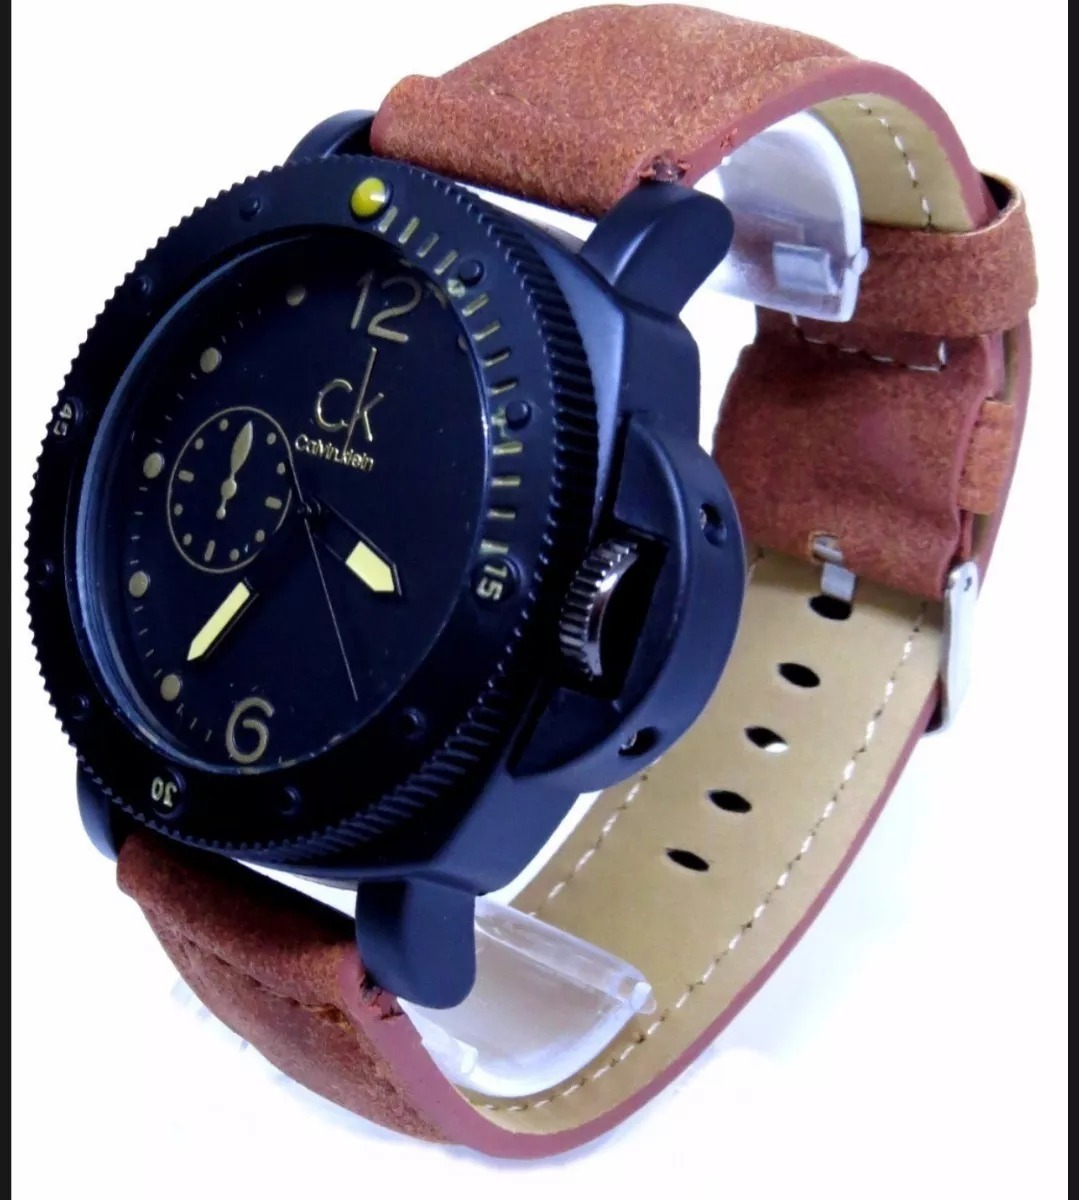 Relógios Masculinos Ck A Prova D água + Óculos - R  120,00 em ... c0aac7a4fe